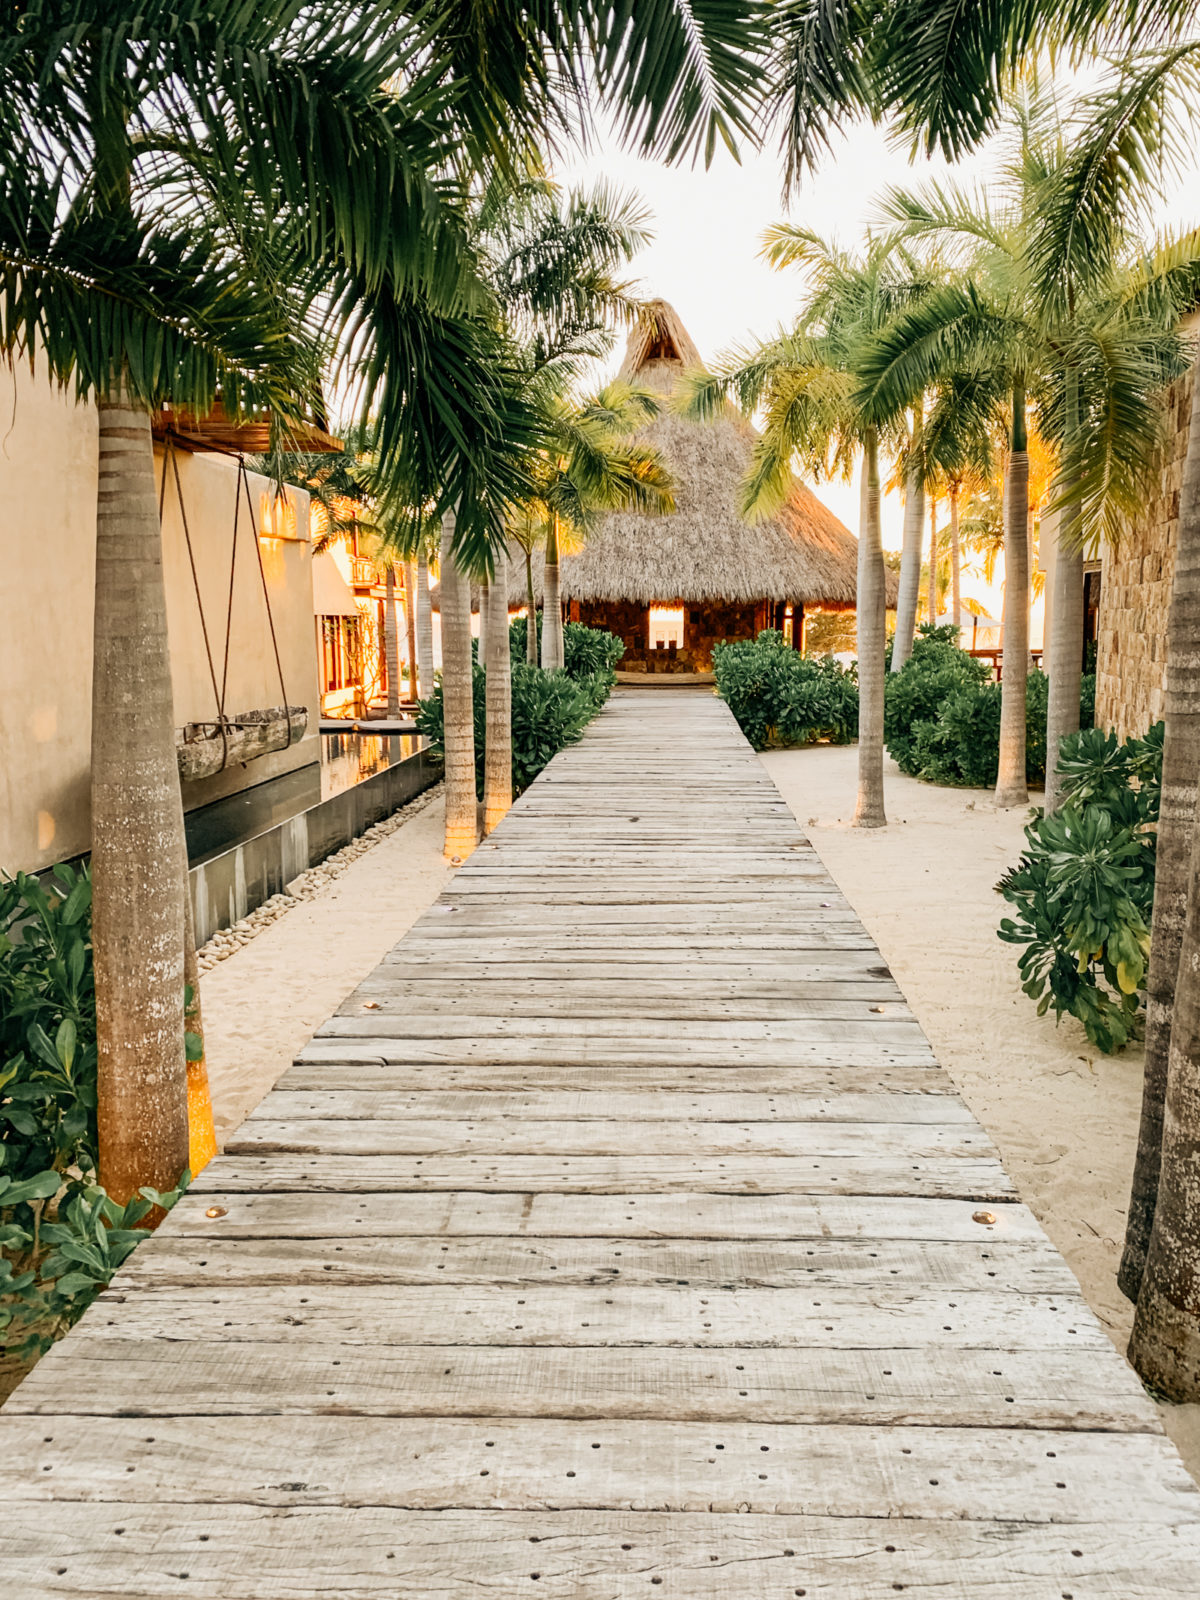 Casa Koko in Punta Mita, Mexico